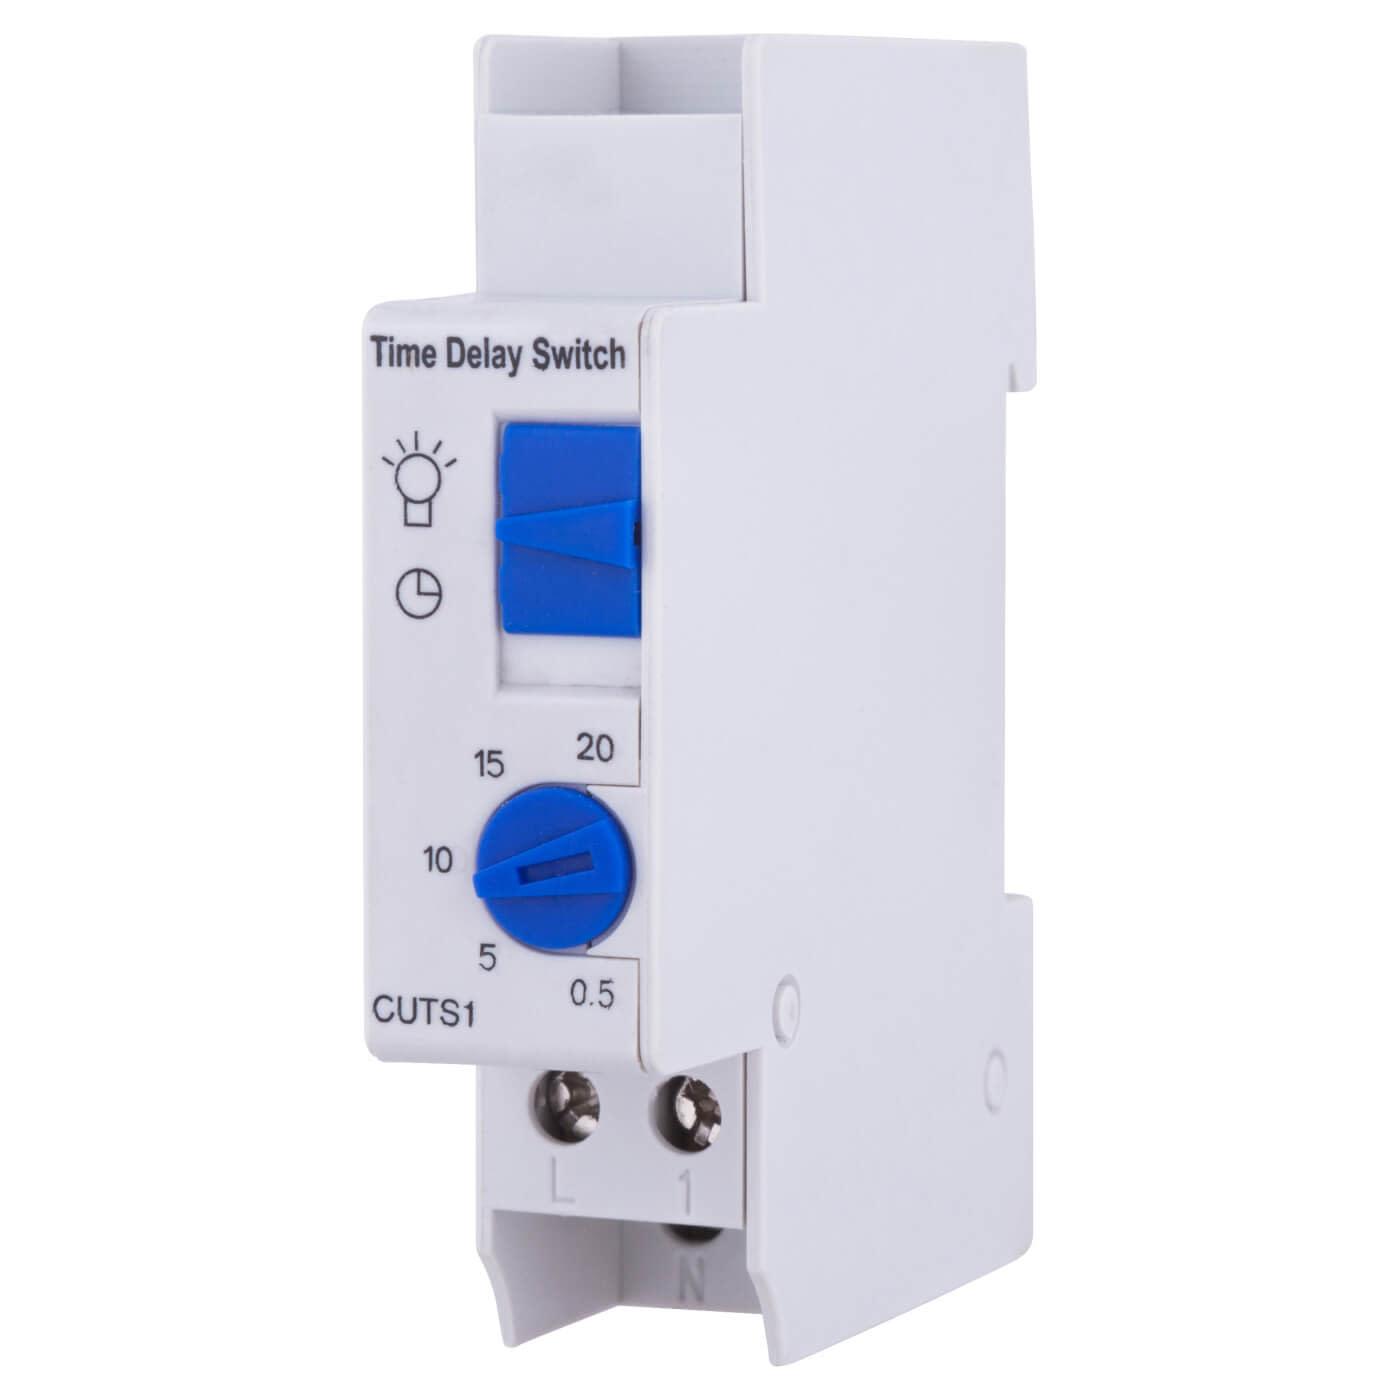 BG Time Delay Switch Consumer Unit Module)